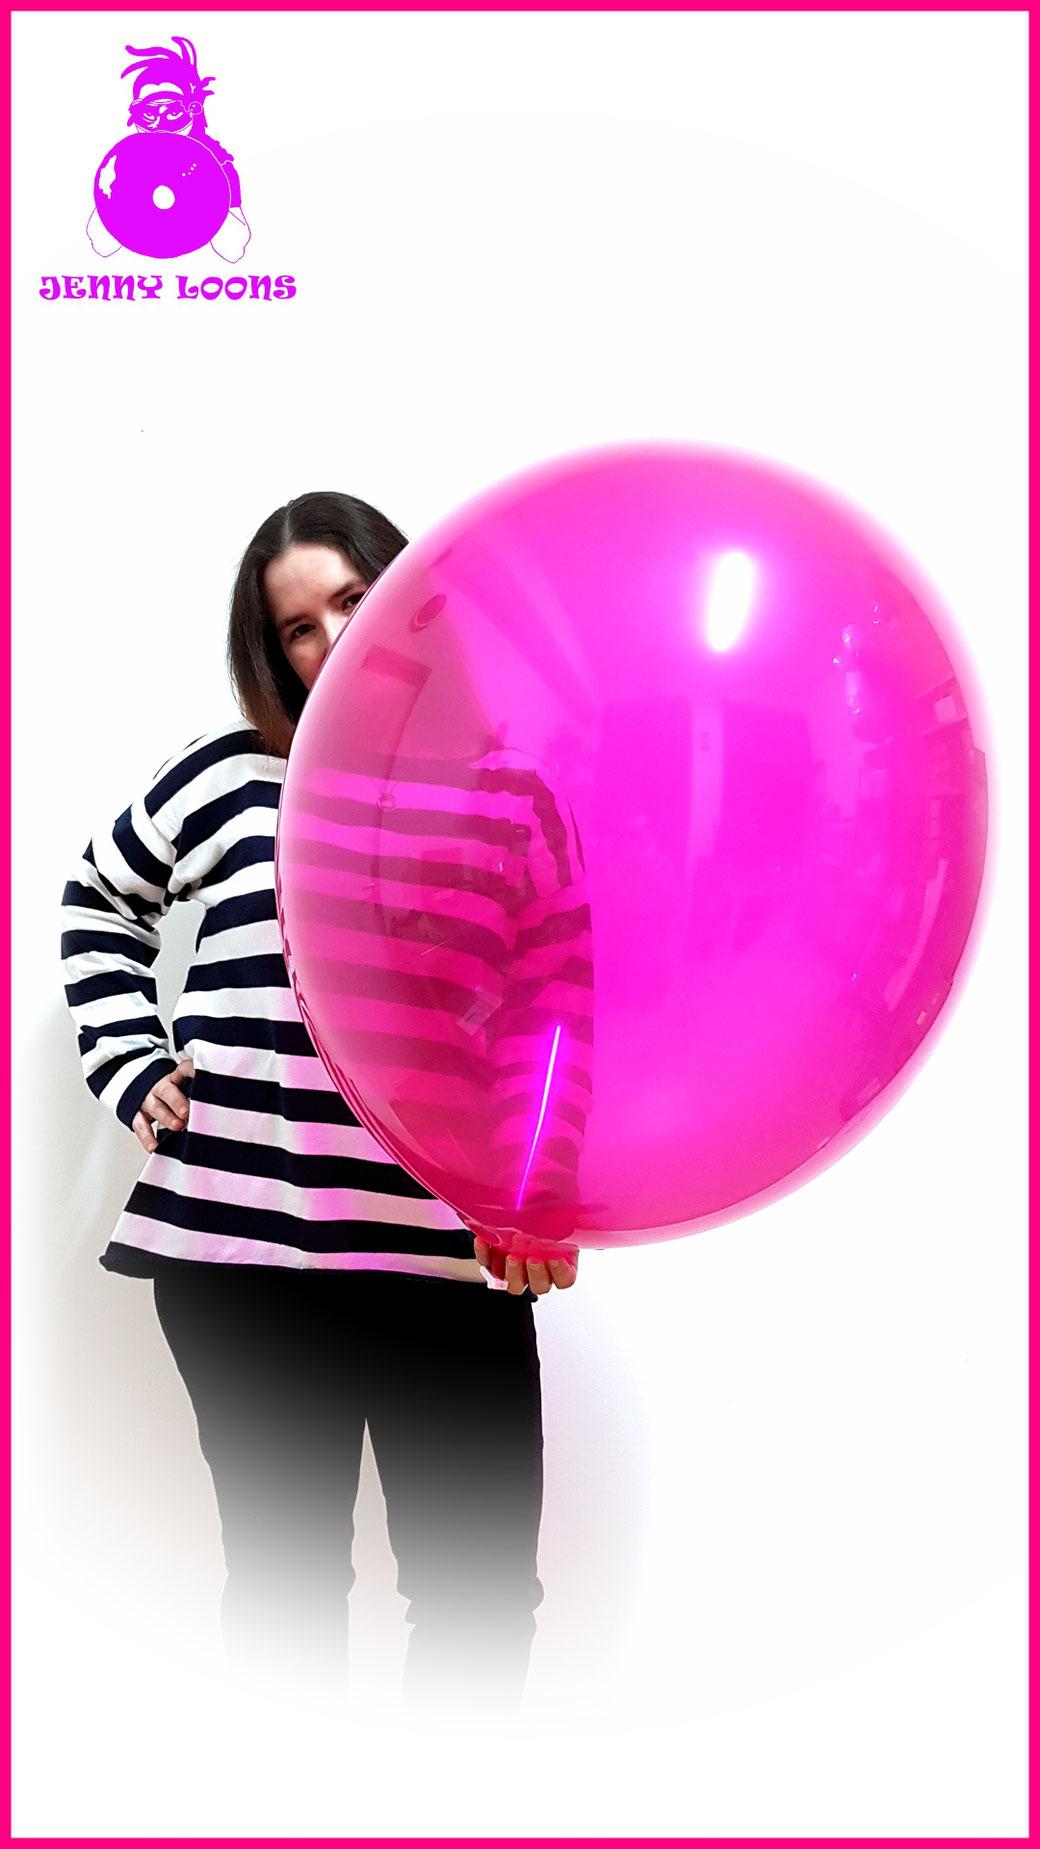 "TUFTEX TUF-TEX Luftballons Riesenballons Ballons Balloons 24inch 24"" 60cm Riese Giant Looner Kristall Crystal pink colors fun party Hameln Ballonshop Heliumballons"